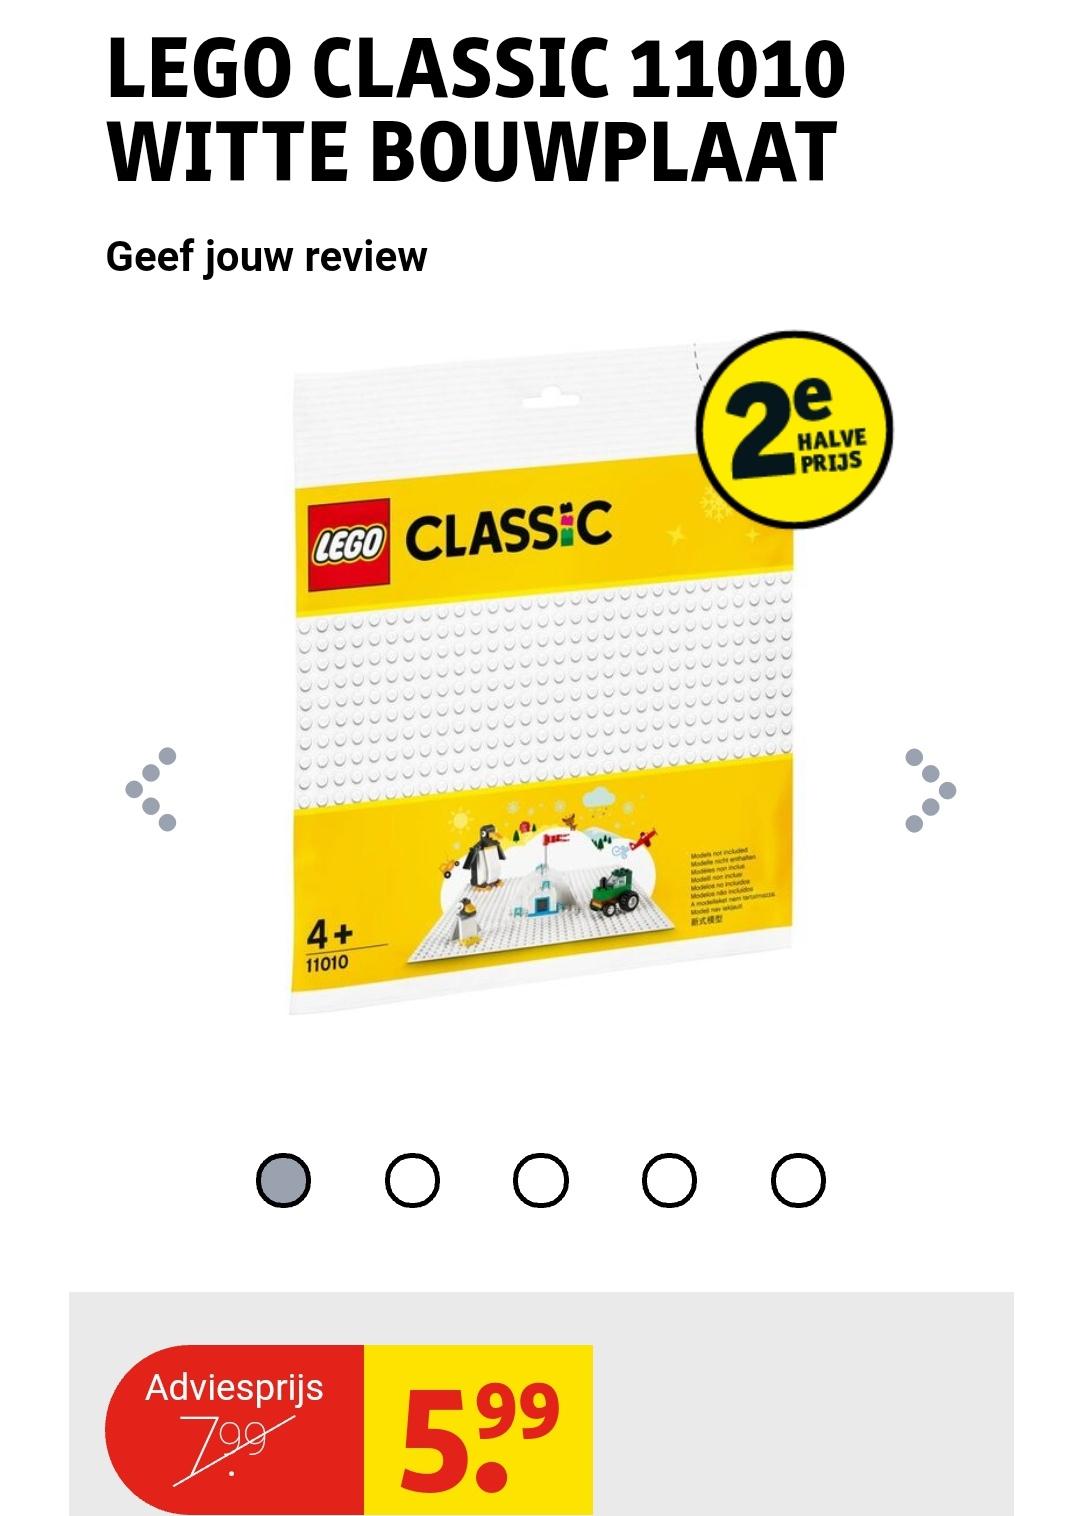 LEGO Classic 11010 Witte Bouwplaat @Kruidvat